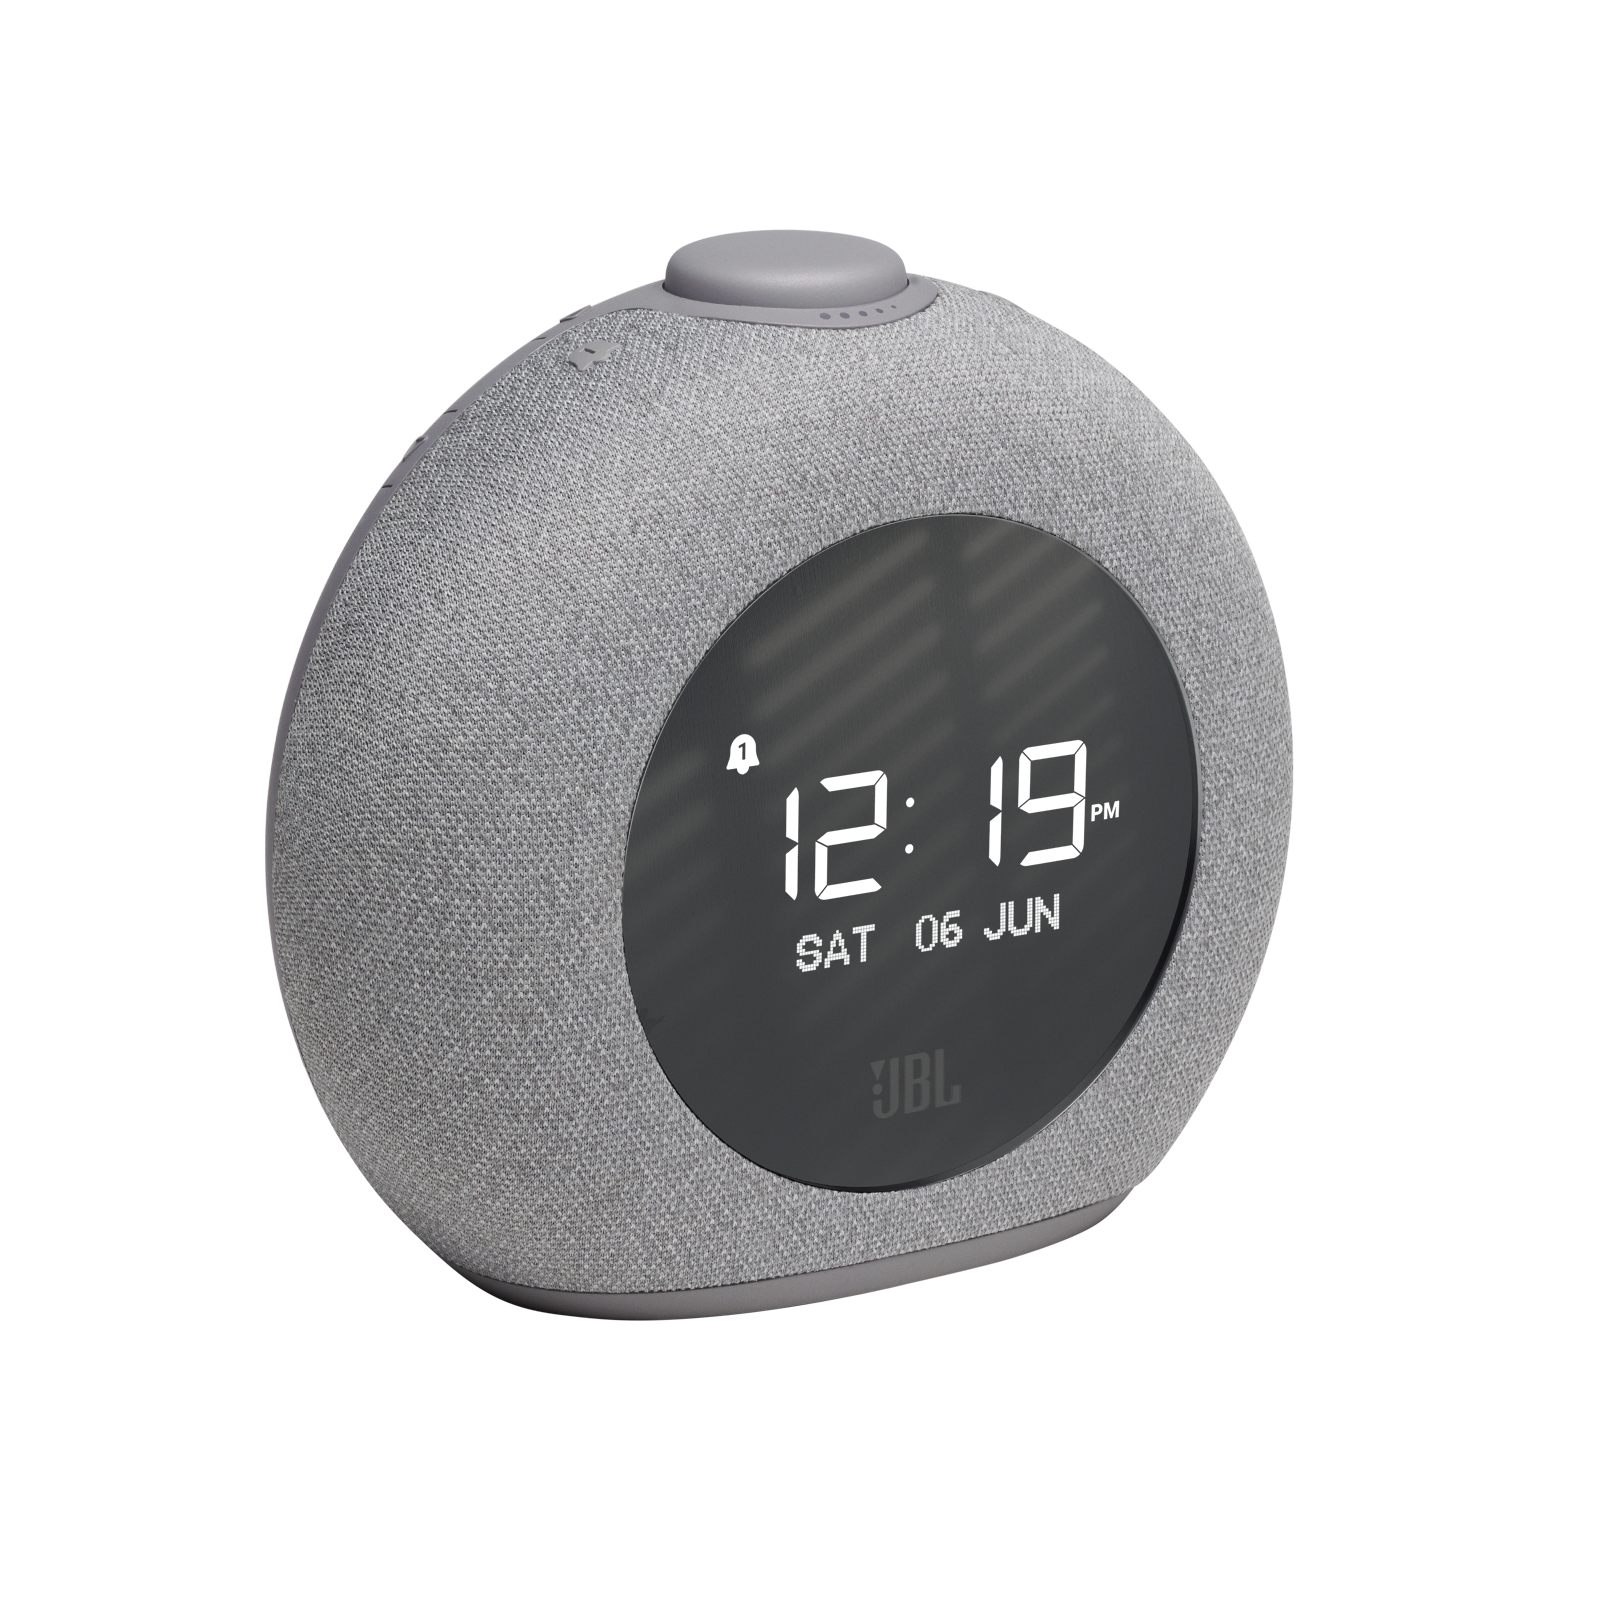 JBL Horizon 2 DAB - Grey - Bluetooth clock radio speaker with DAB/DAB+/FM - Hero